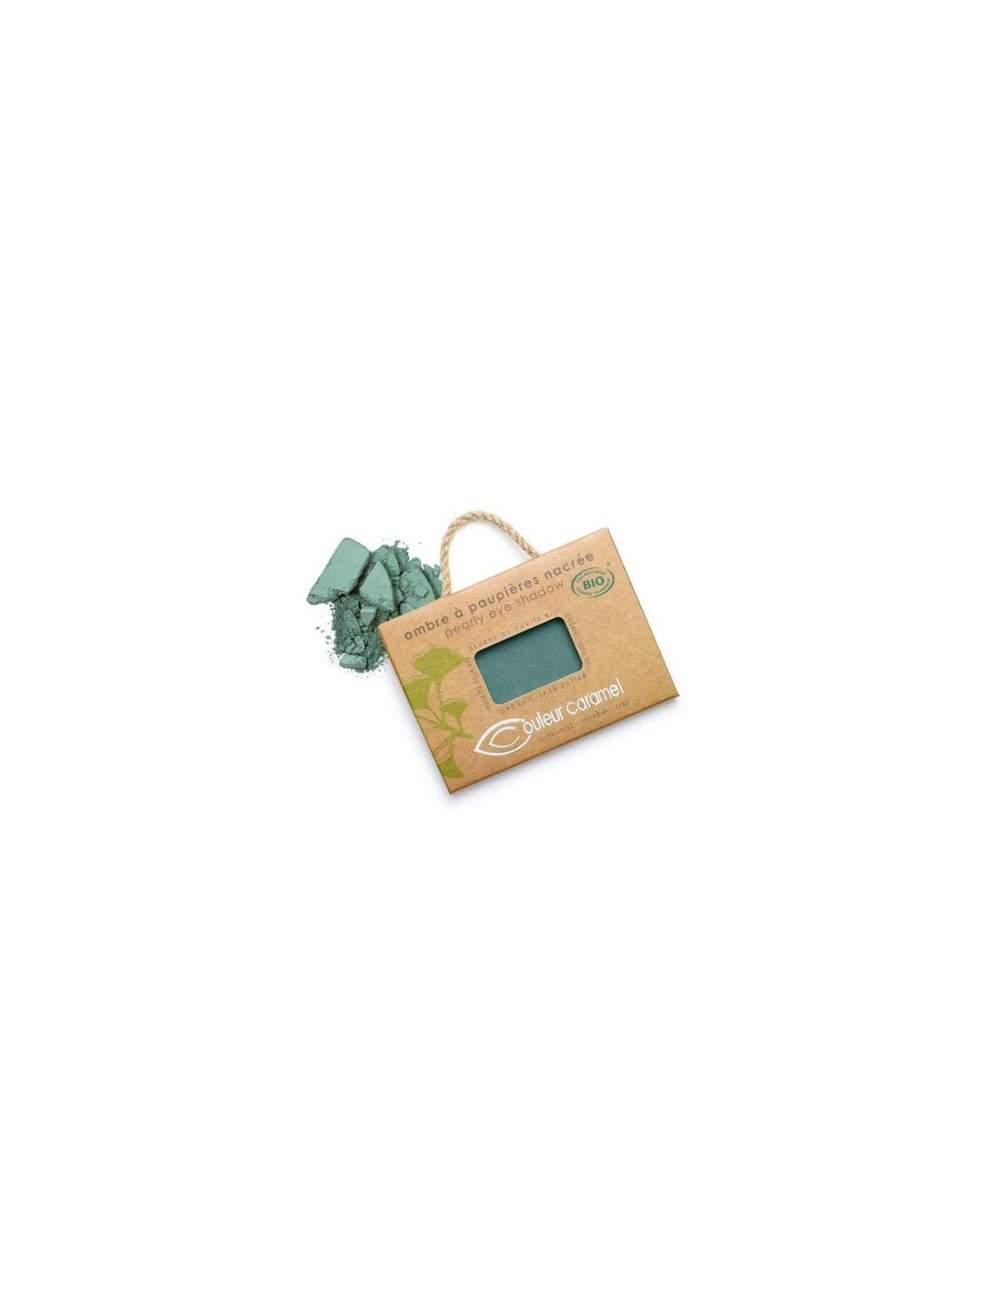 Sombra de Ojos Bio Nacarada 50 Bluish Green. Couleur Caramel